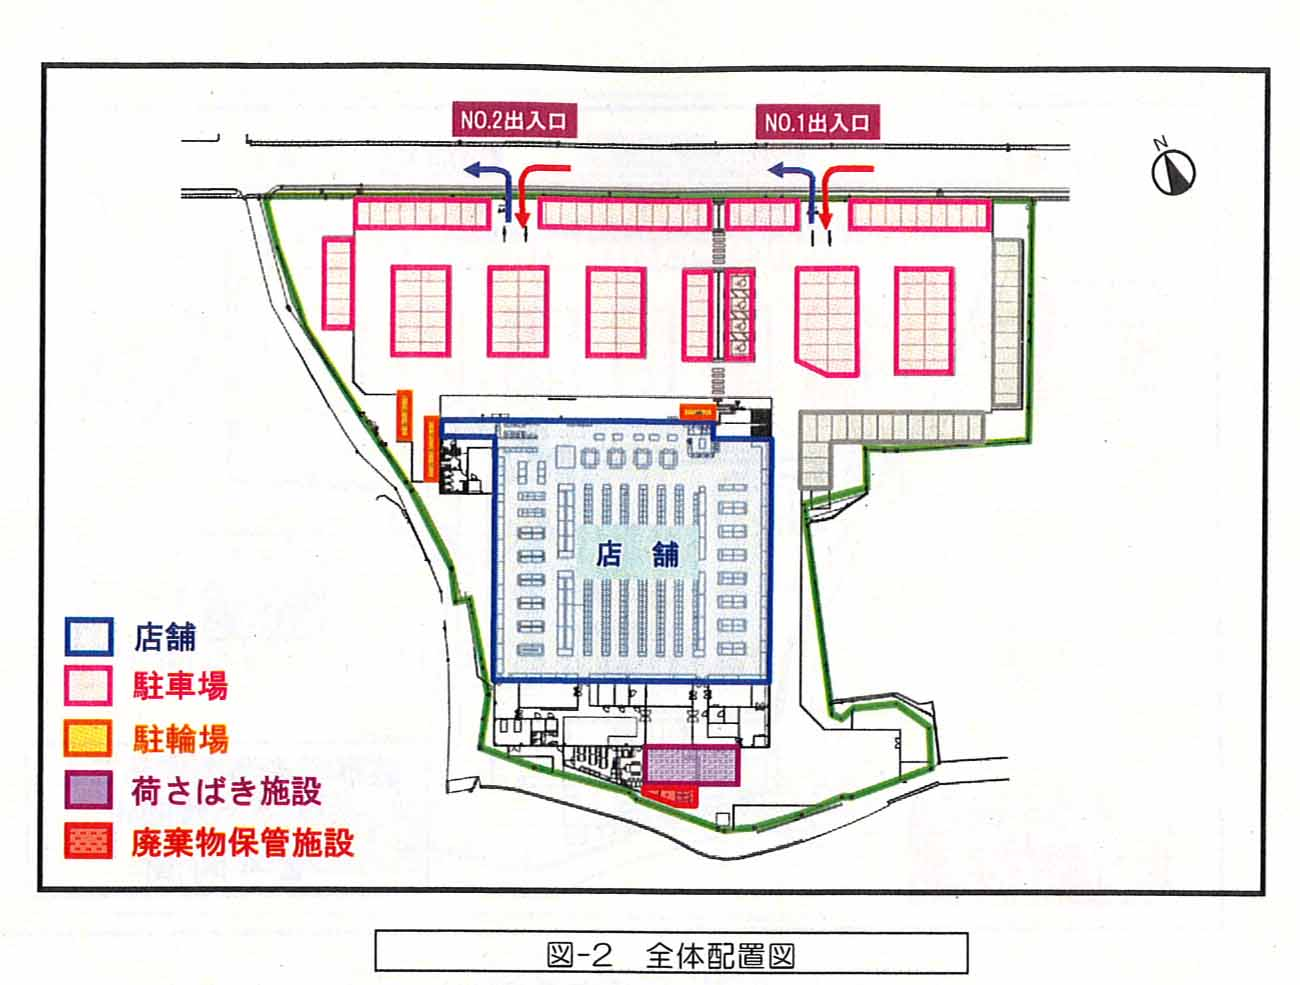 マックスバリュ富士荒田島店 出店説明会_f0141310_2212824.jpg